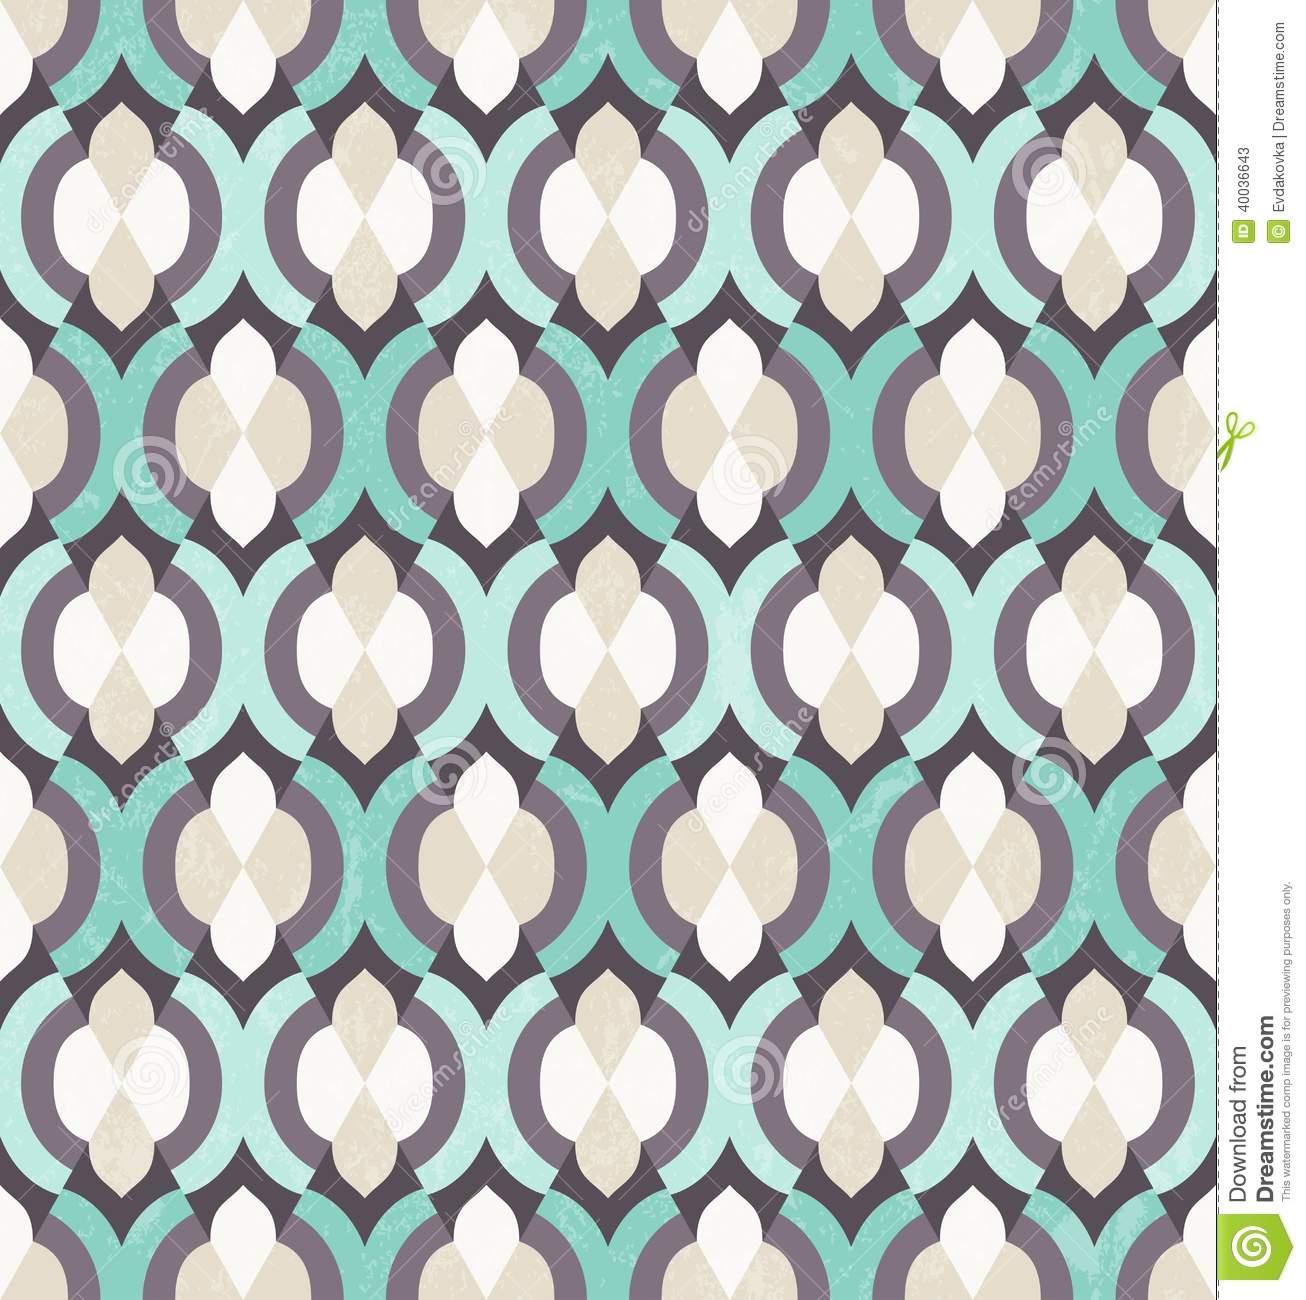 Trellis Background Wallpaper: Moroccan Lattice Wallpaper